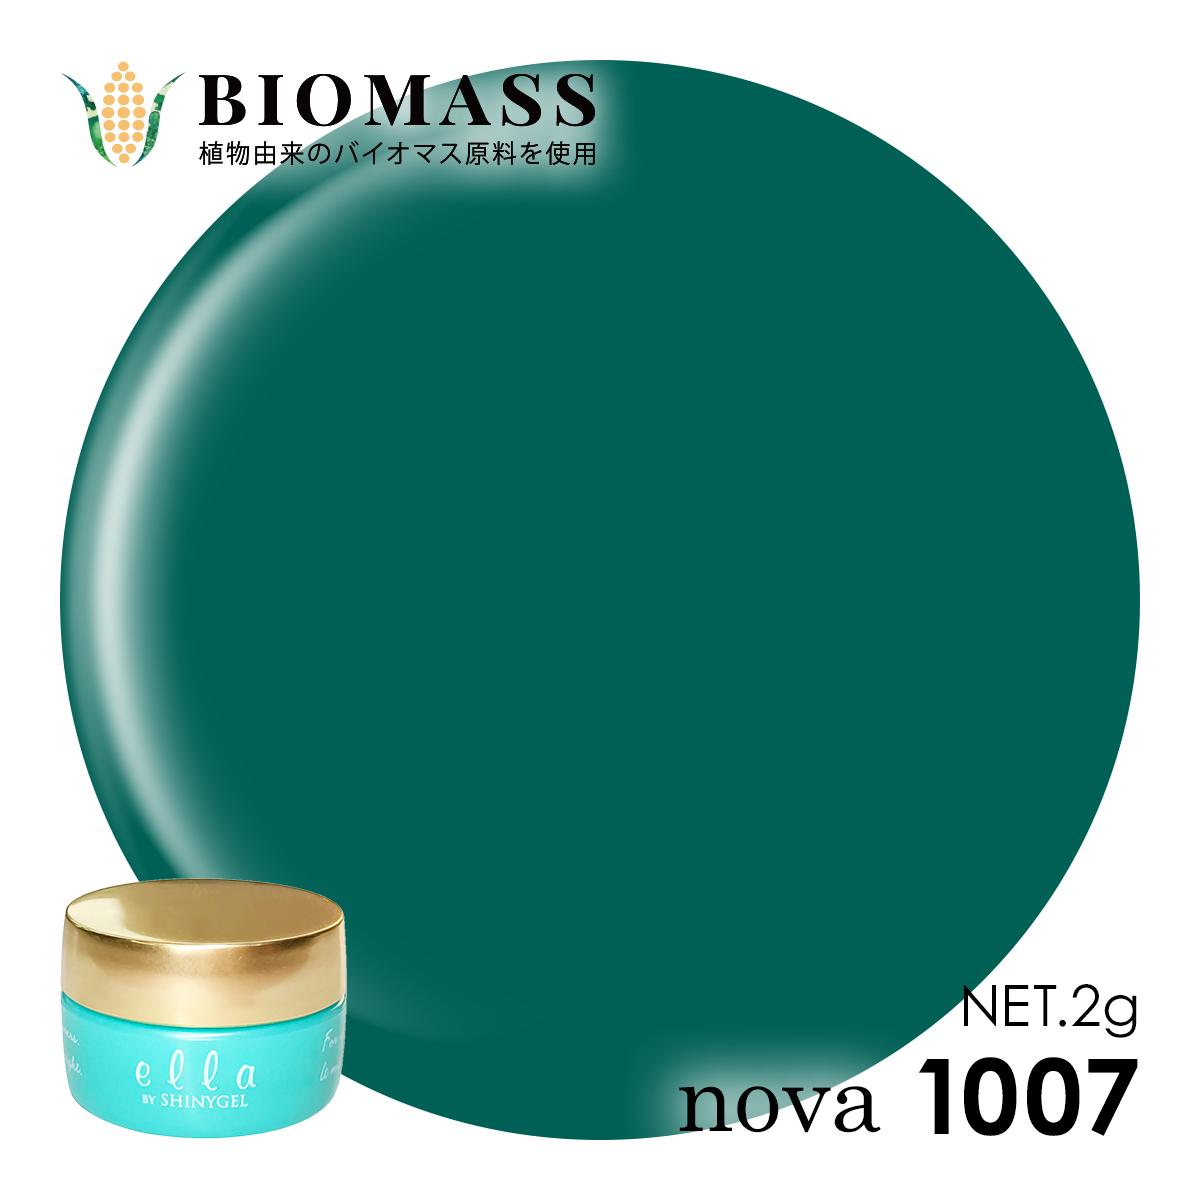 ella BY SHINYGEL Nova Color Gel 2g / 1007 Green Wood